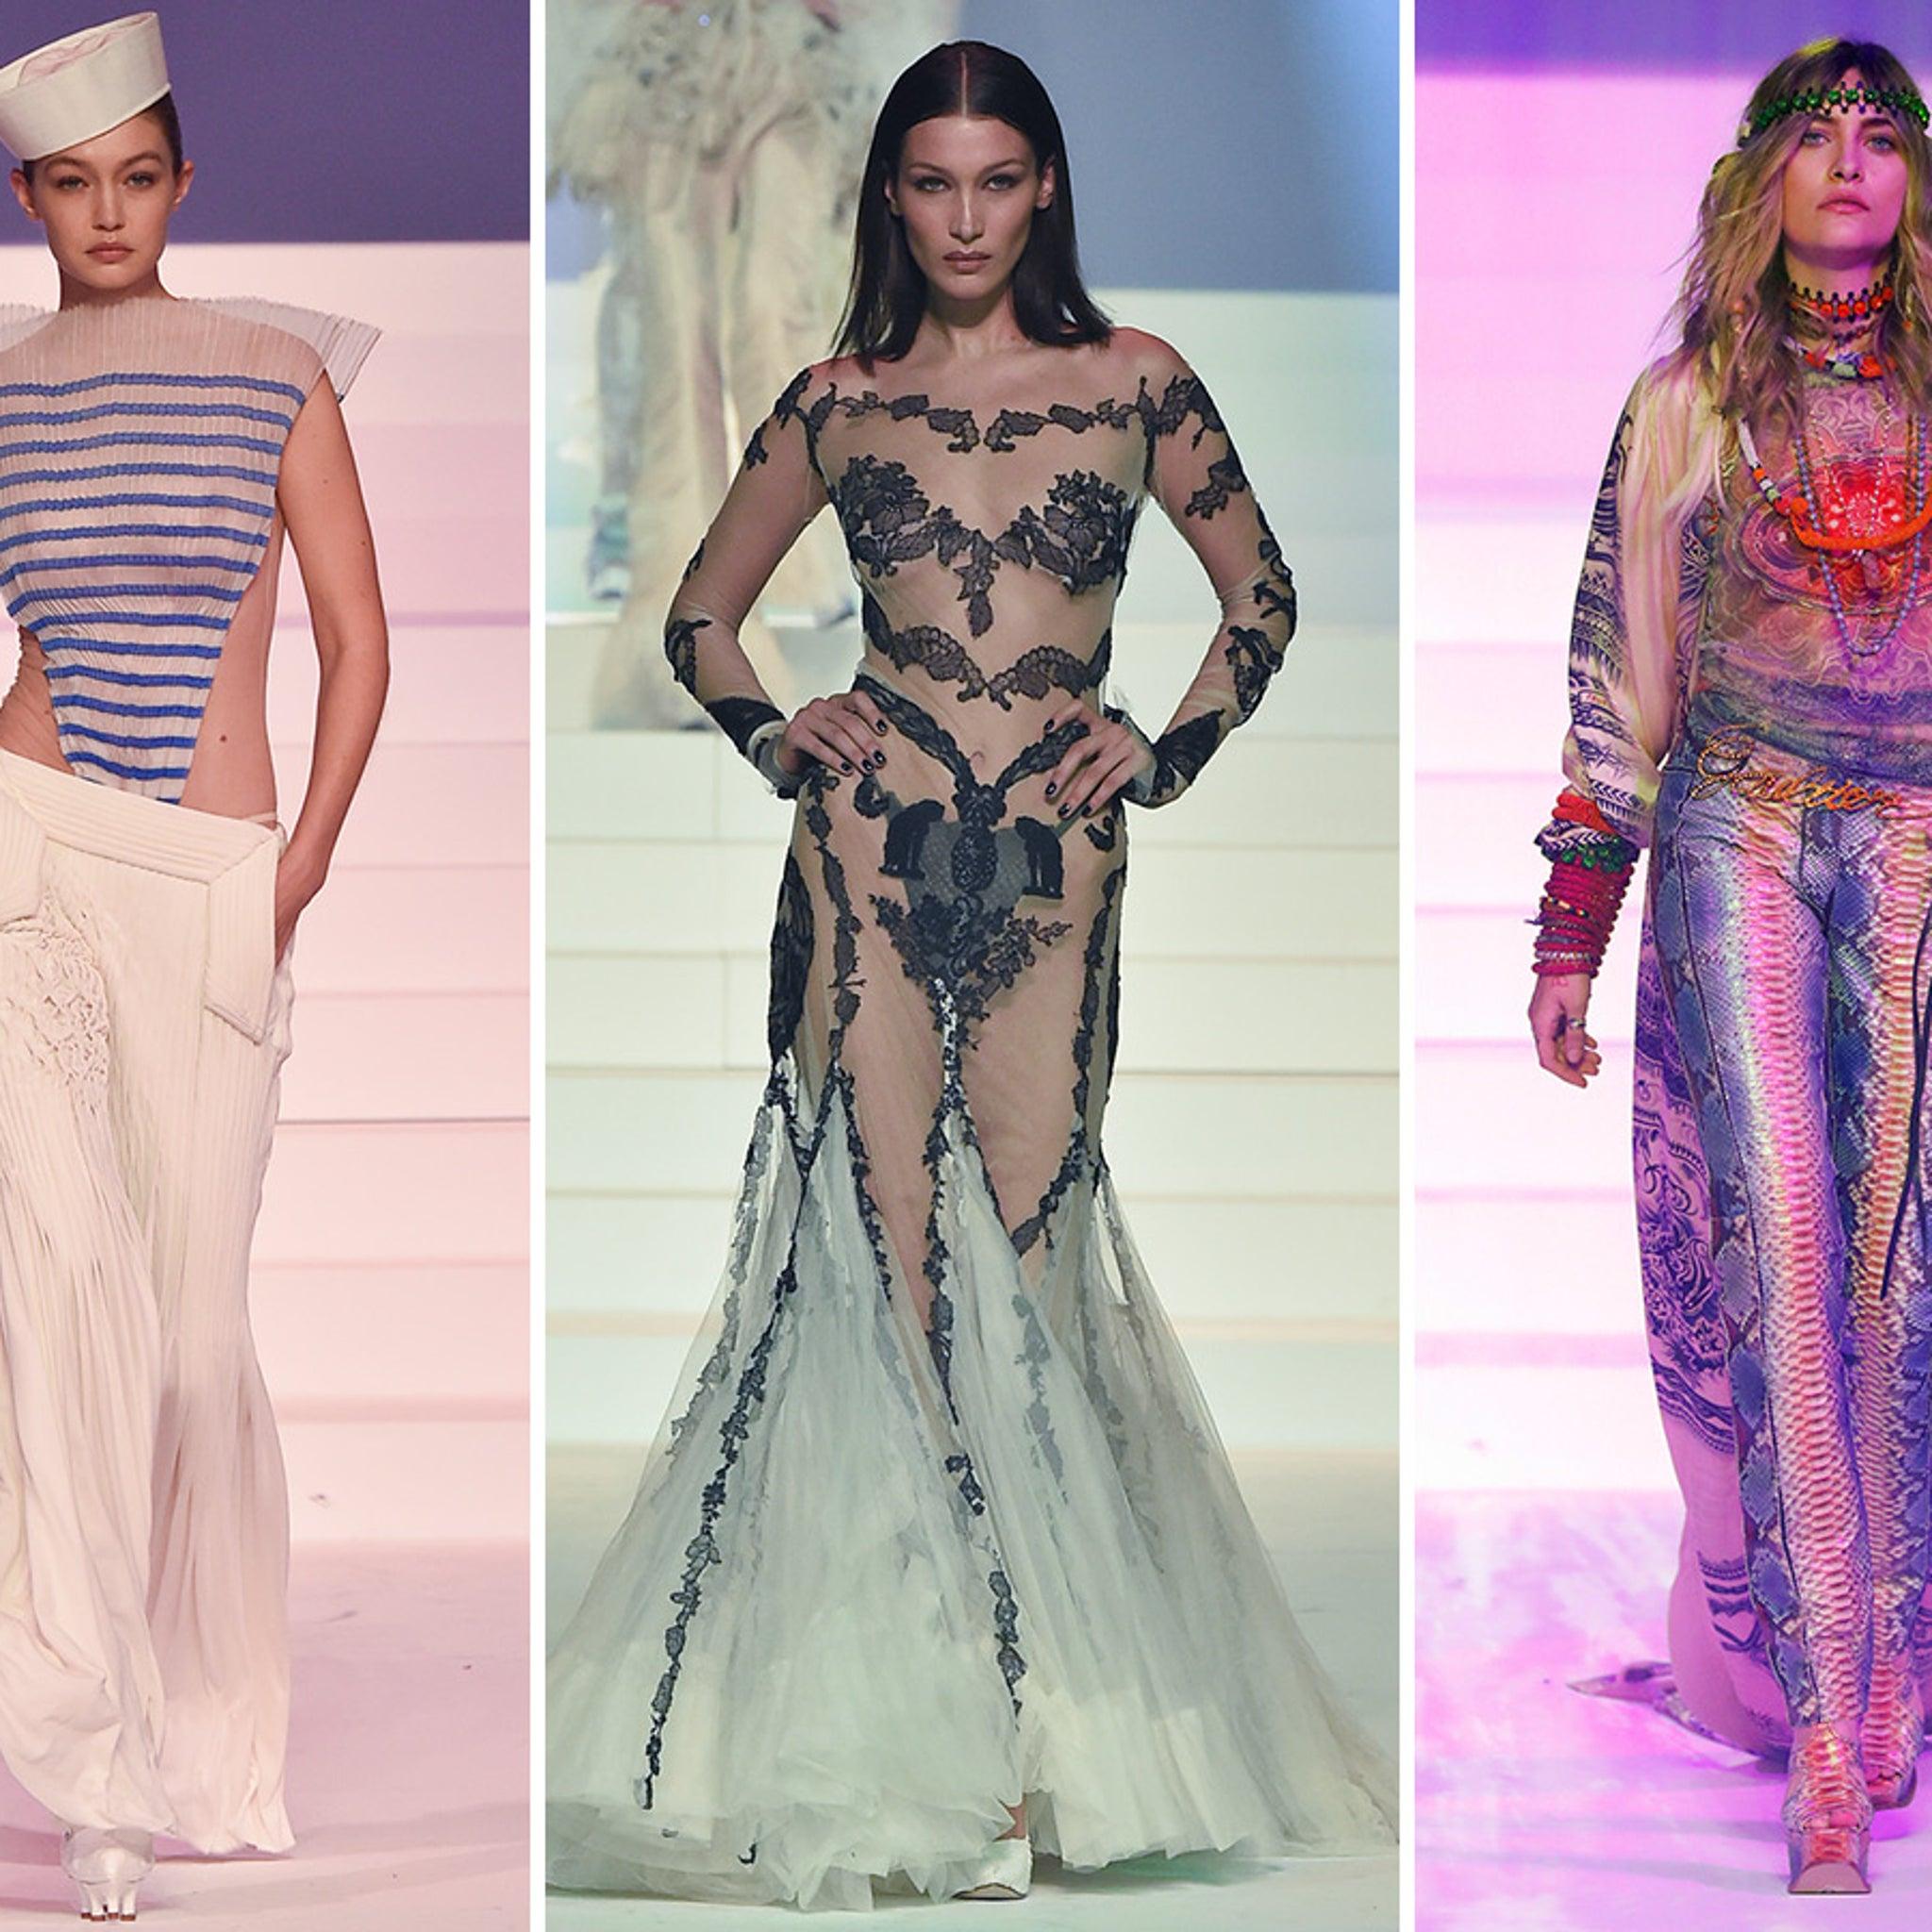 Gigi, Bella Hadid, Paris Jackson Walk Jean-Paul Gaultier's Final Runway Show